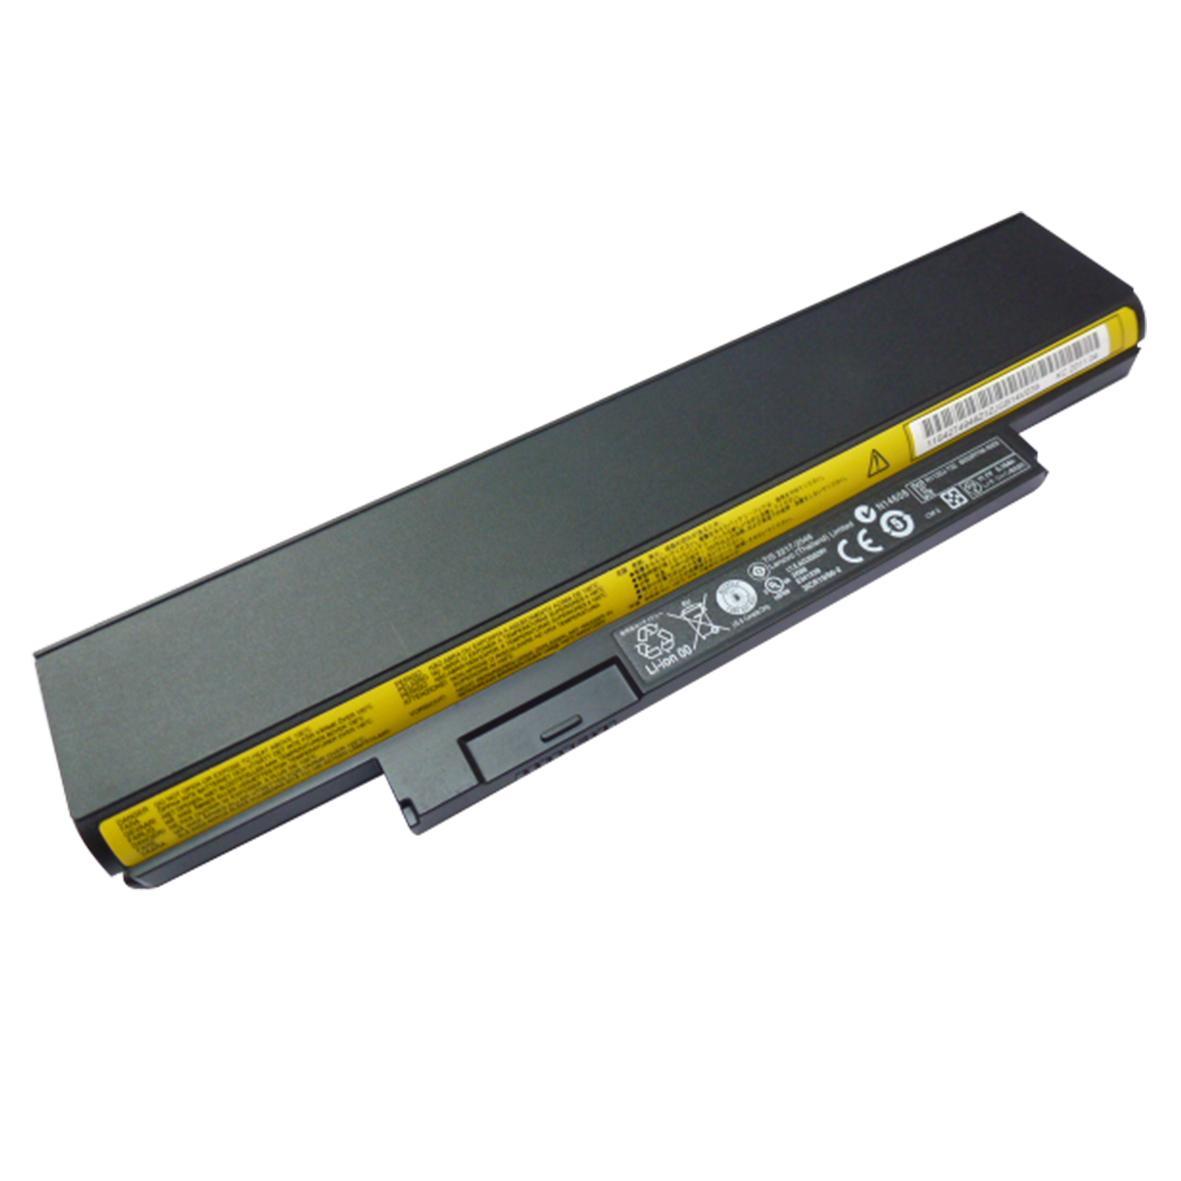 Baterai LENOVO Thinkpad E120, E125, E130, E135, E320, E325, E330, E335